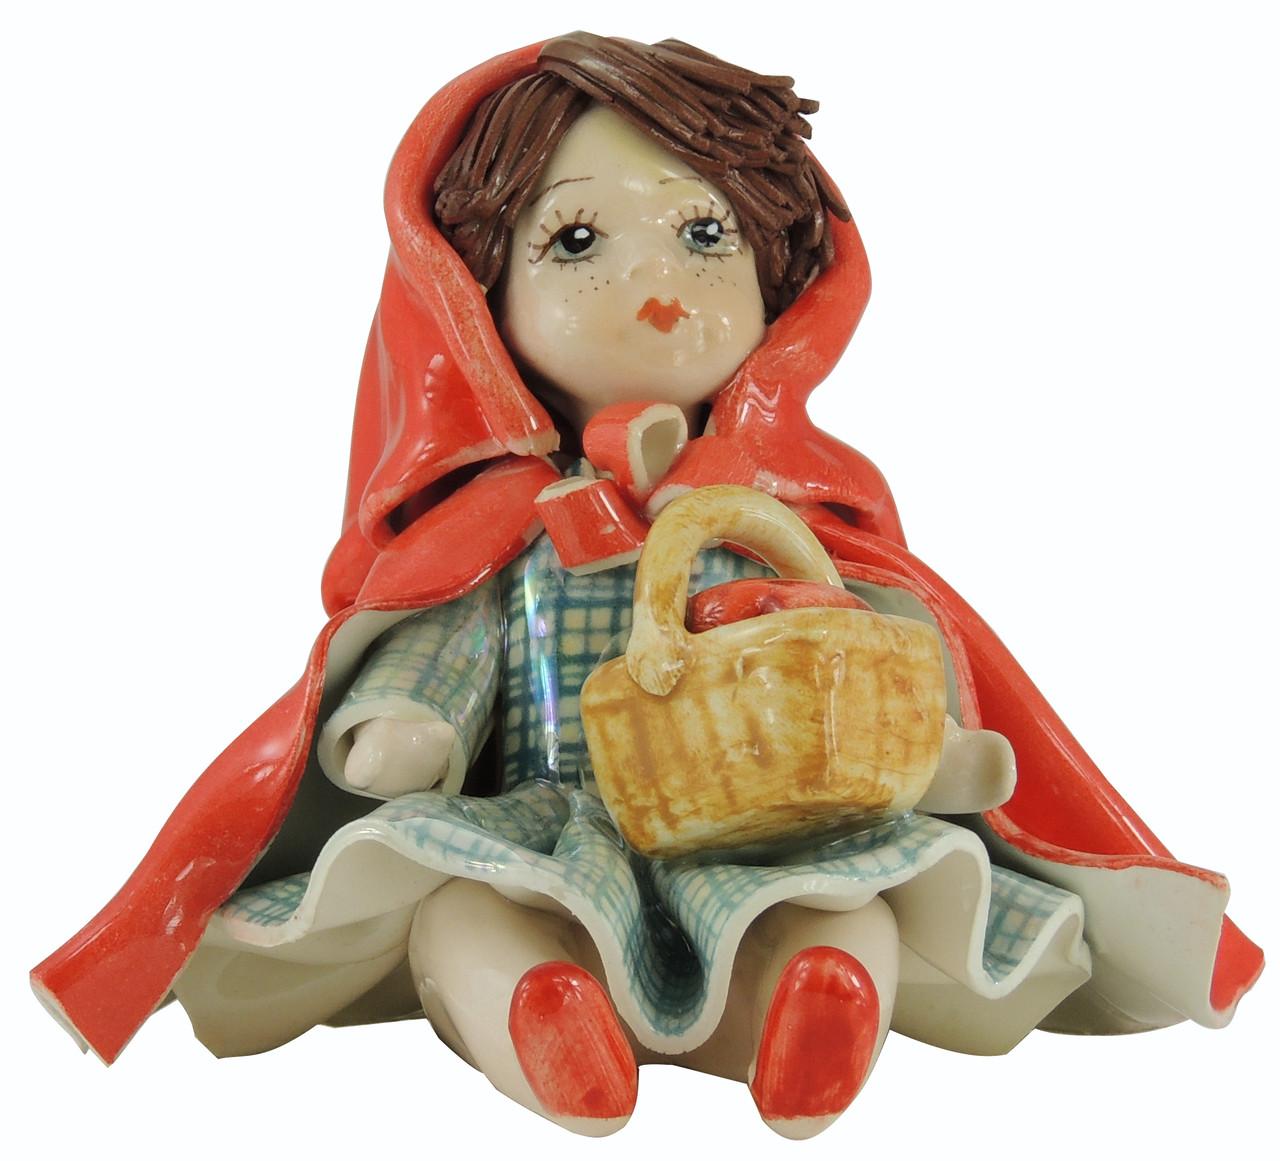 Статуэтка Девочка красная шапочка. Ручная работа, керамика, Италия